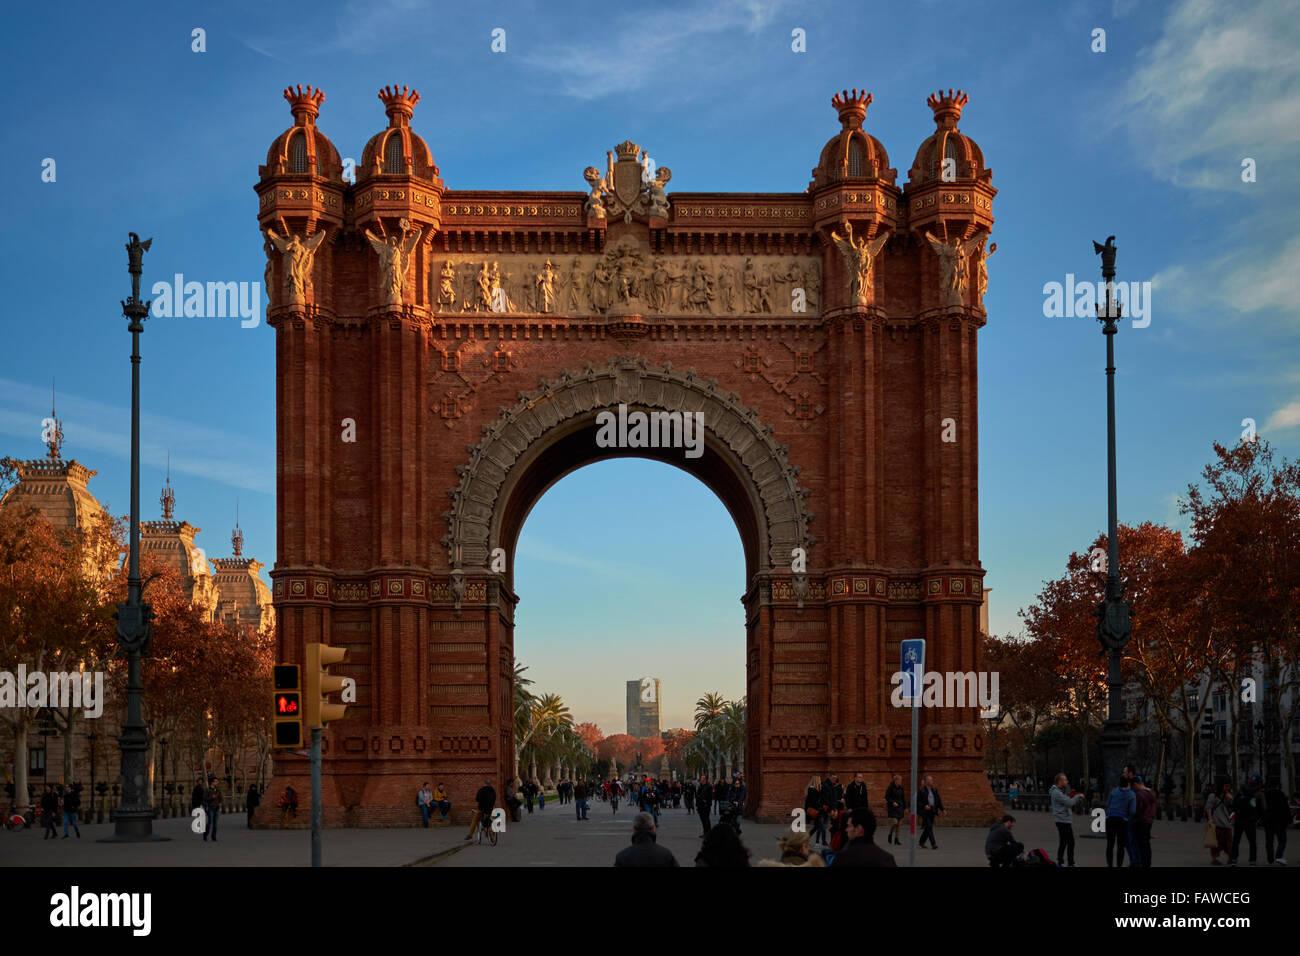 Arc de Triomf, or Arco de Triunfo, in Barcelona. Memorial or triumphal arch. It was built as the main access gate Stock Photo